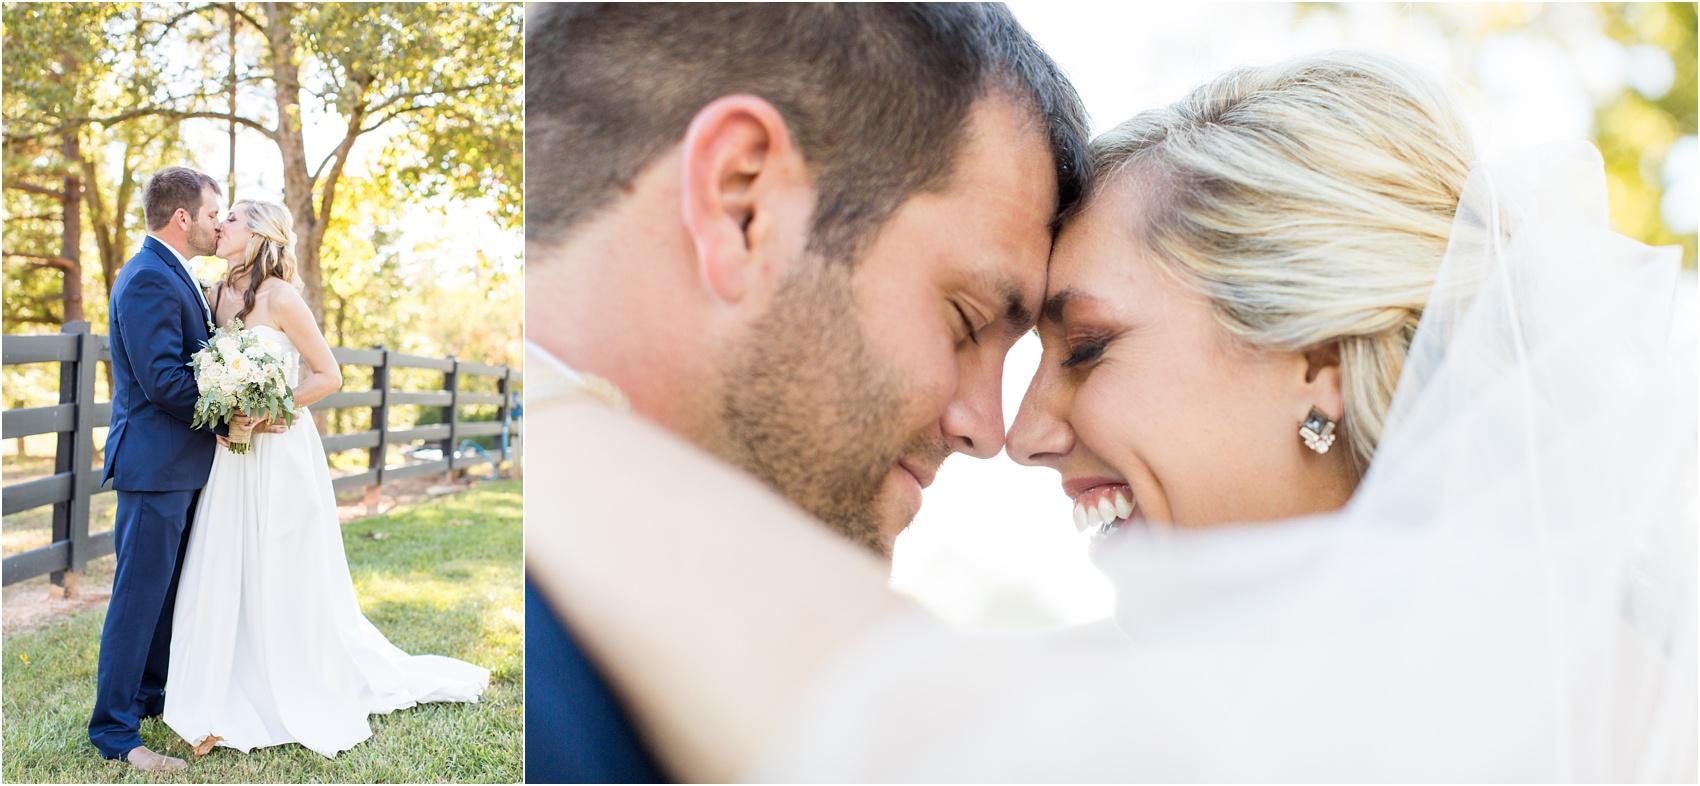 Savannah Eve Photography- Spencer Wedding- Blog-19.jpg